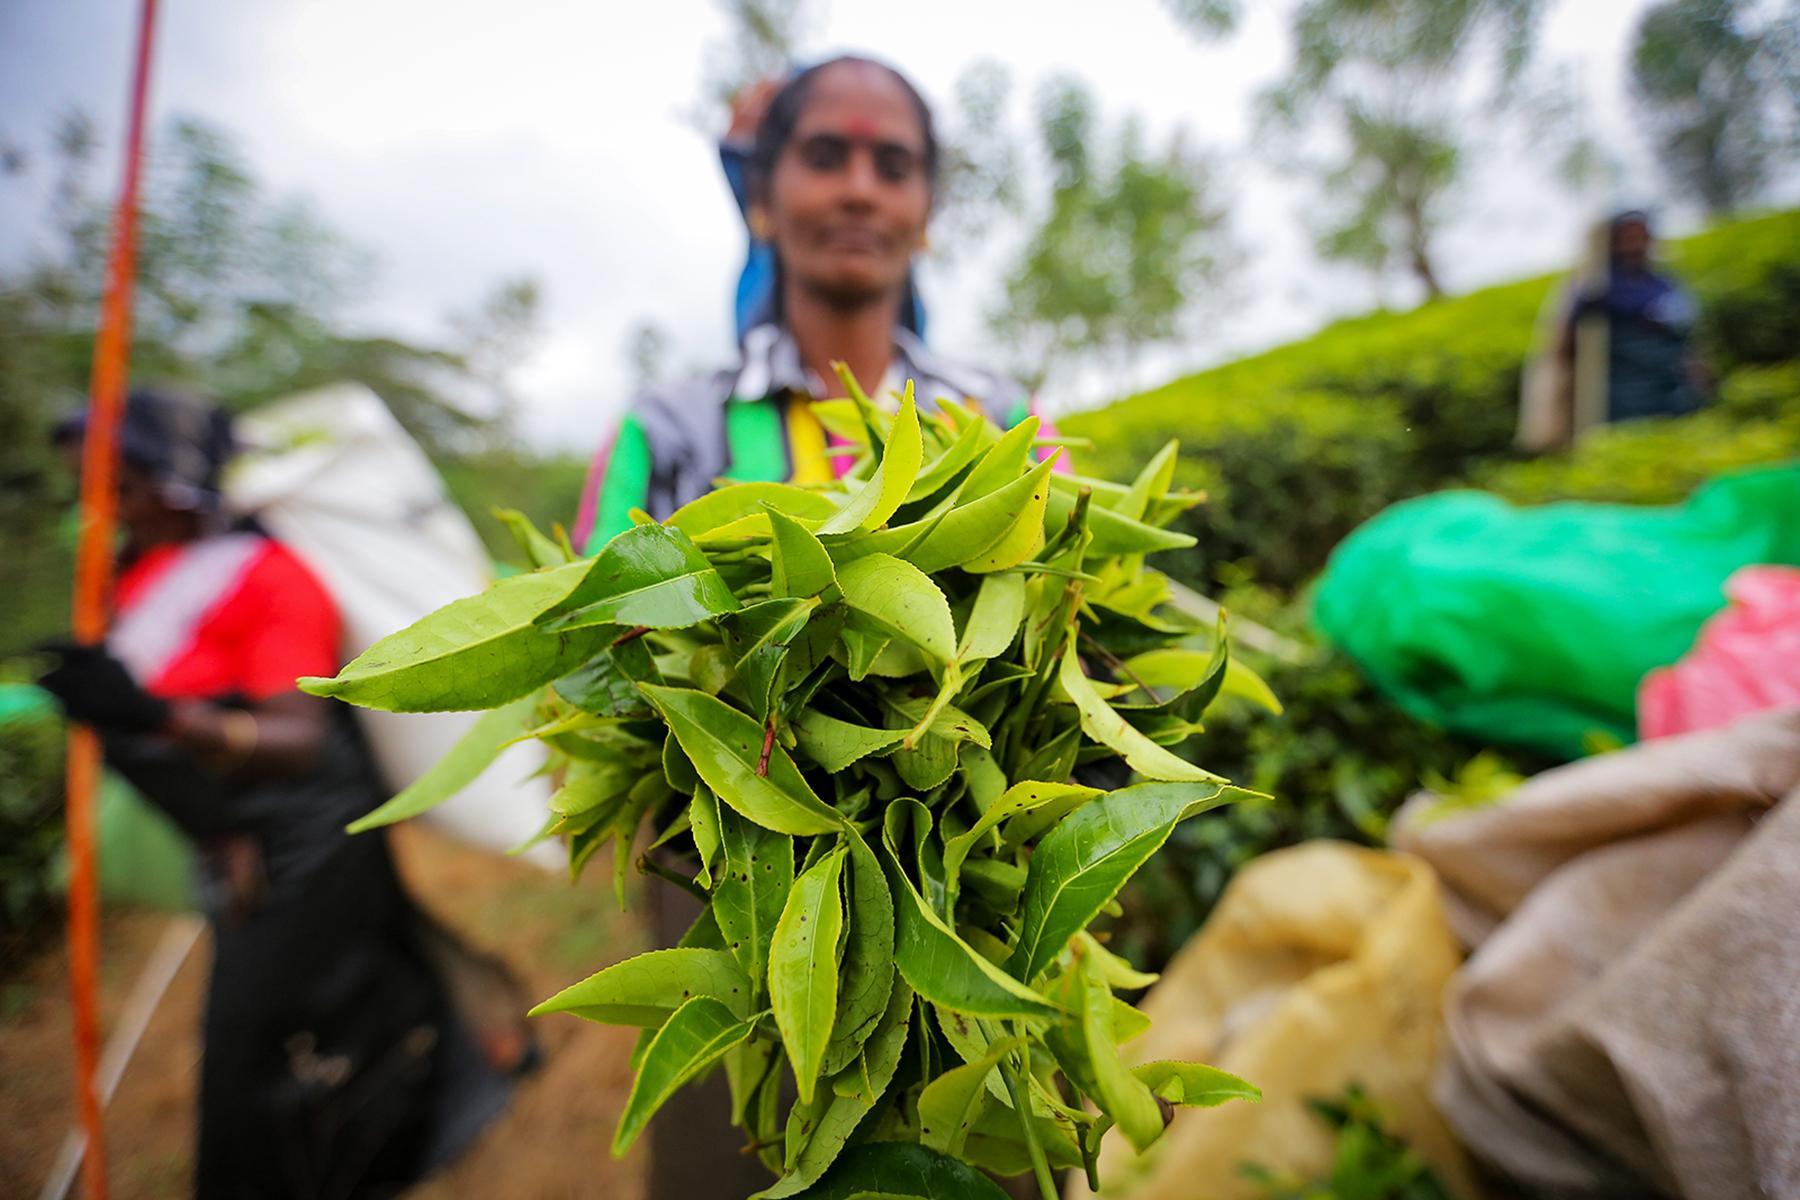 A tea plantation worker shows off plucked tea leaves in the Nuwara Eliya district of Sri Lanka on Feb. 5.